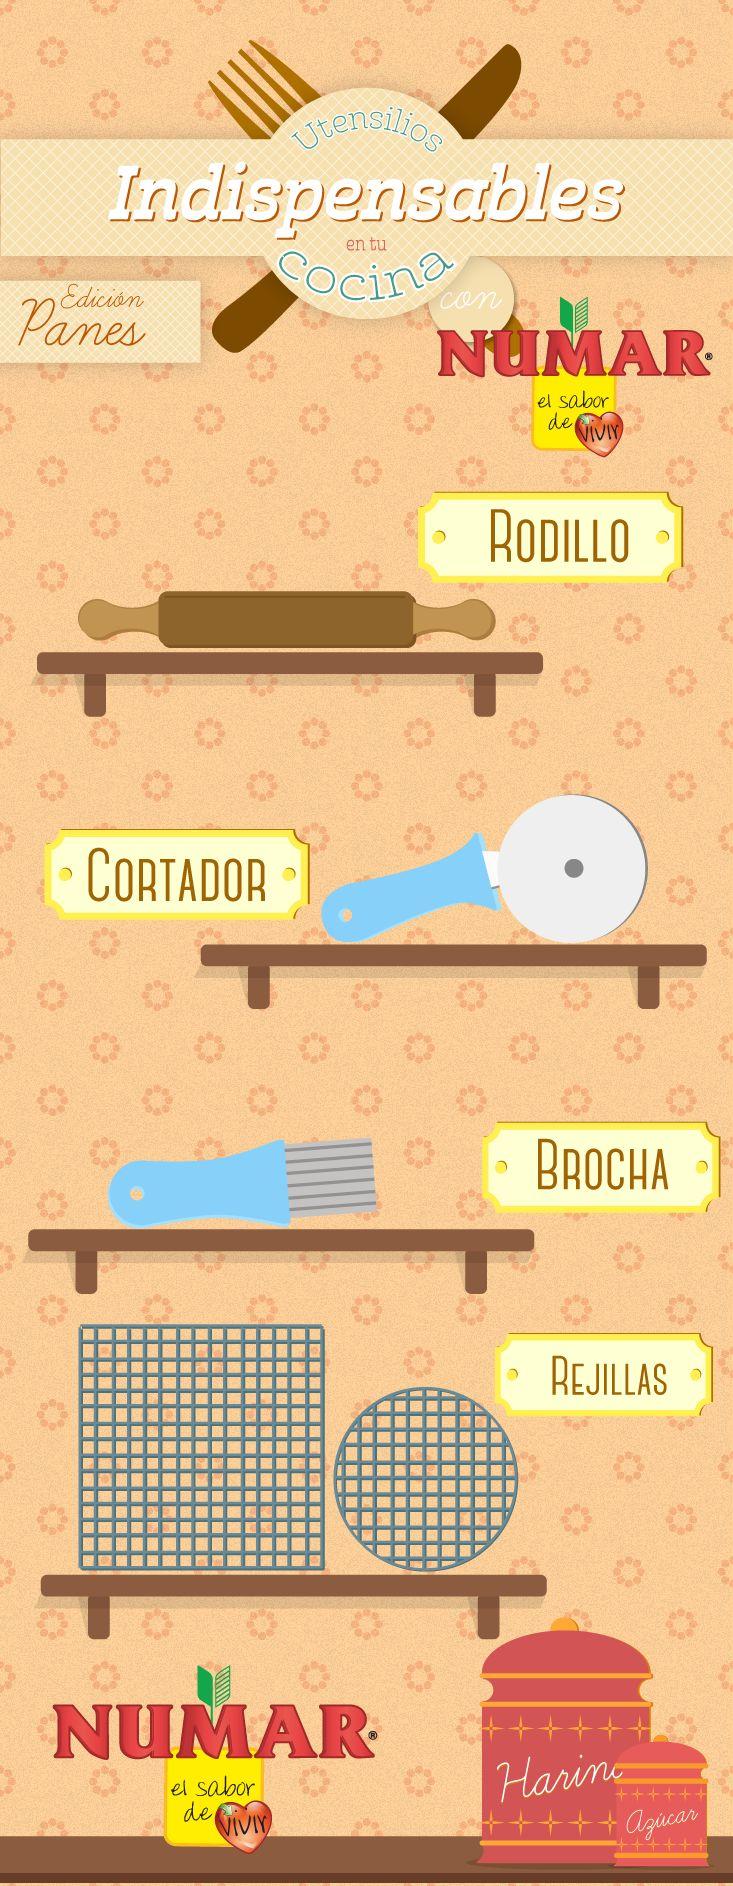 17 best images about queques on pinterest tes cakes and - Instrumentos de cocina ...